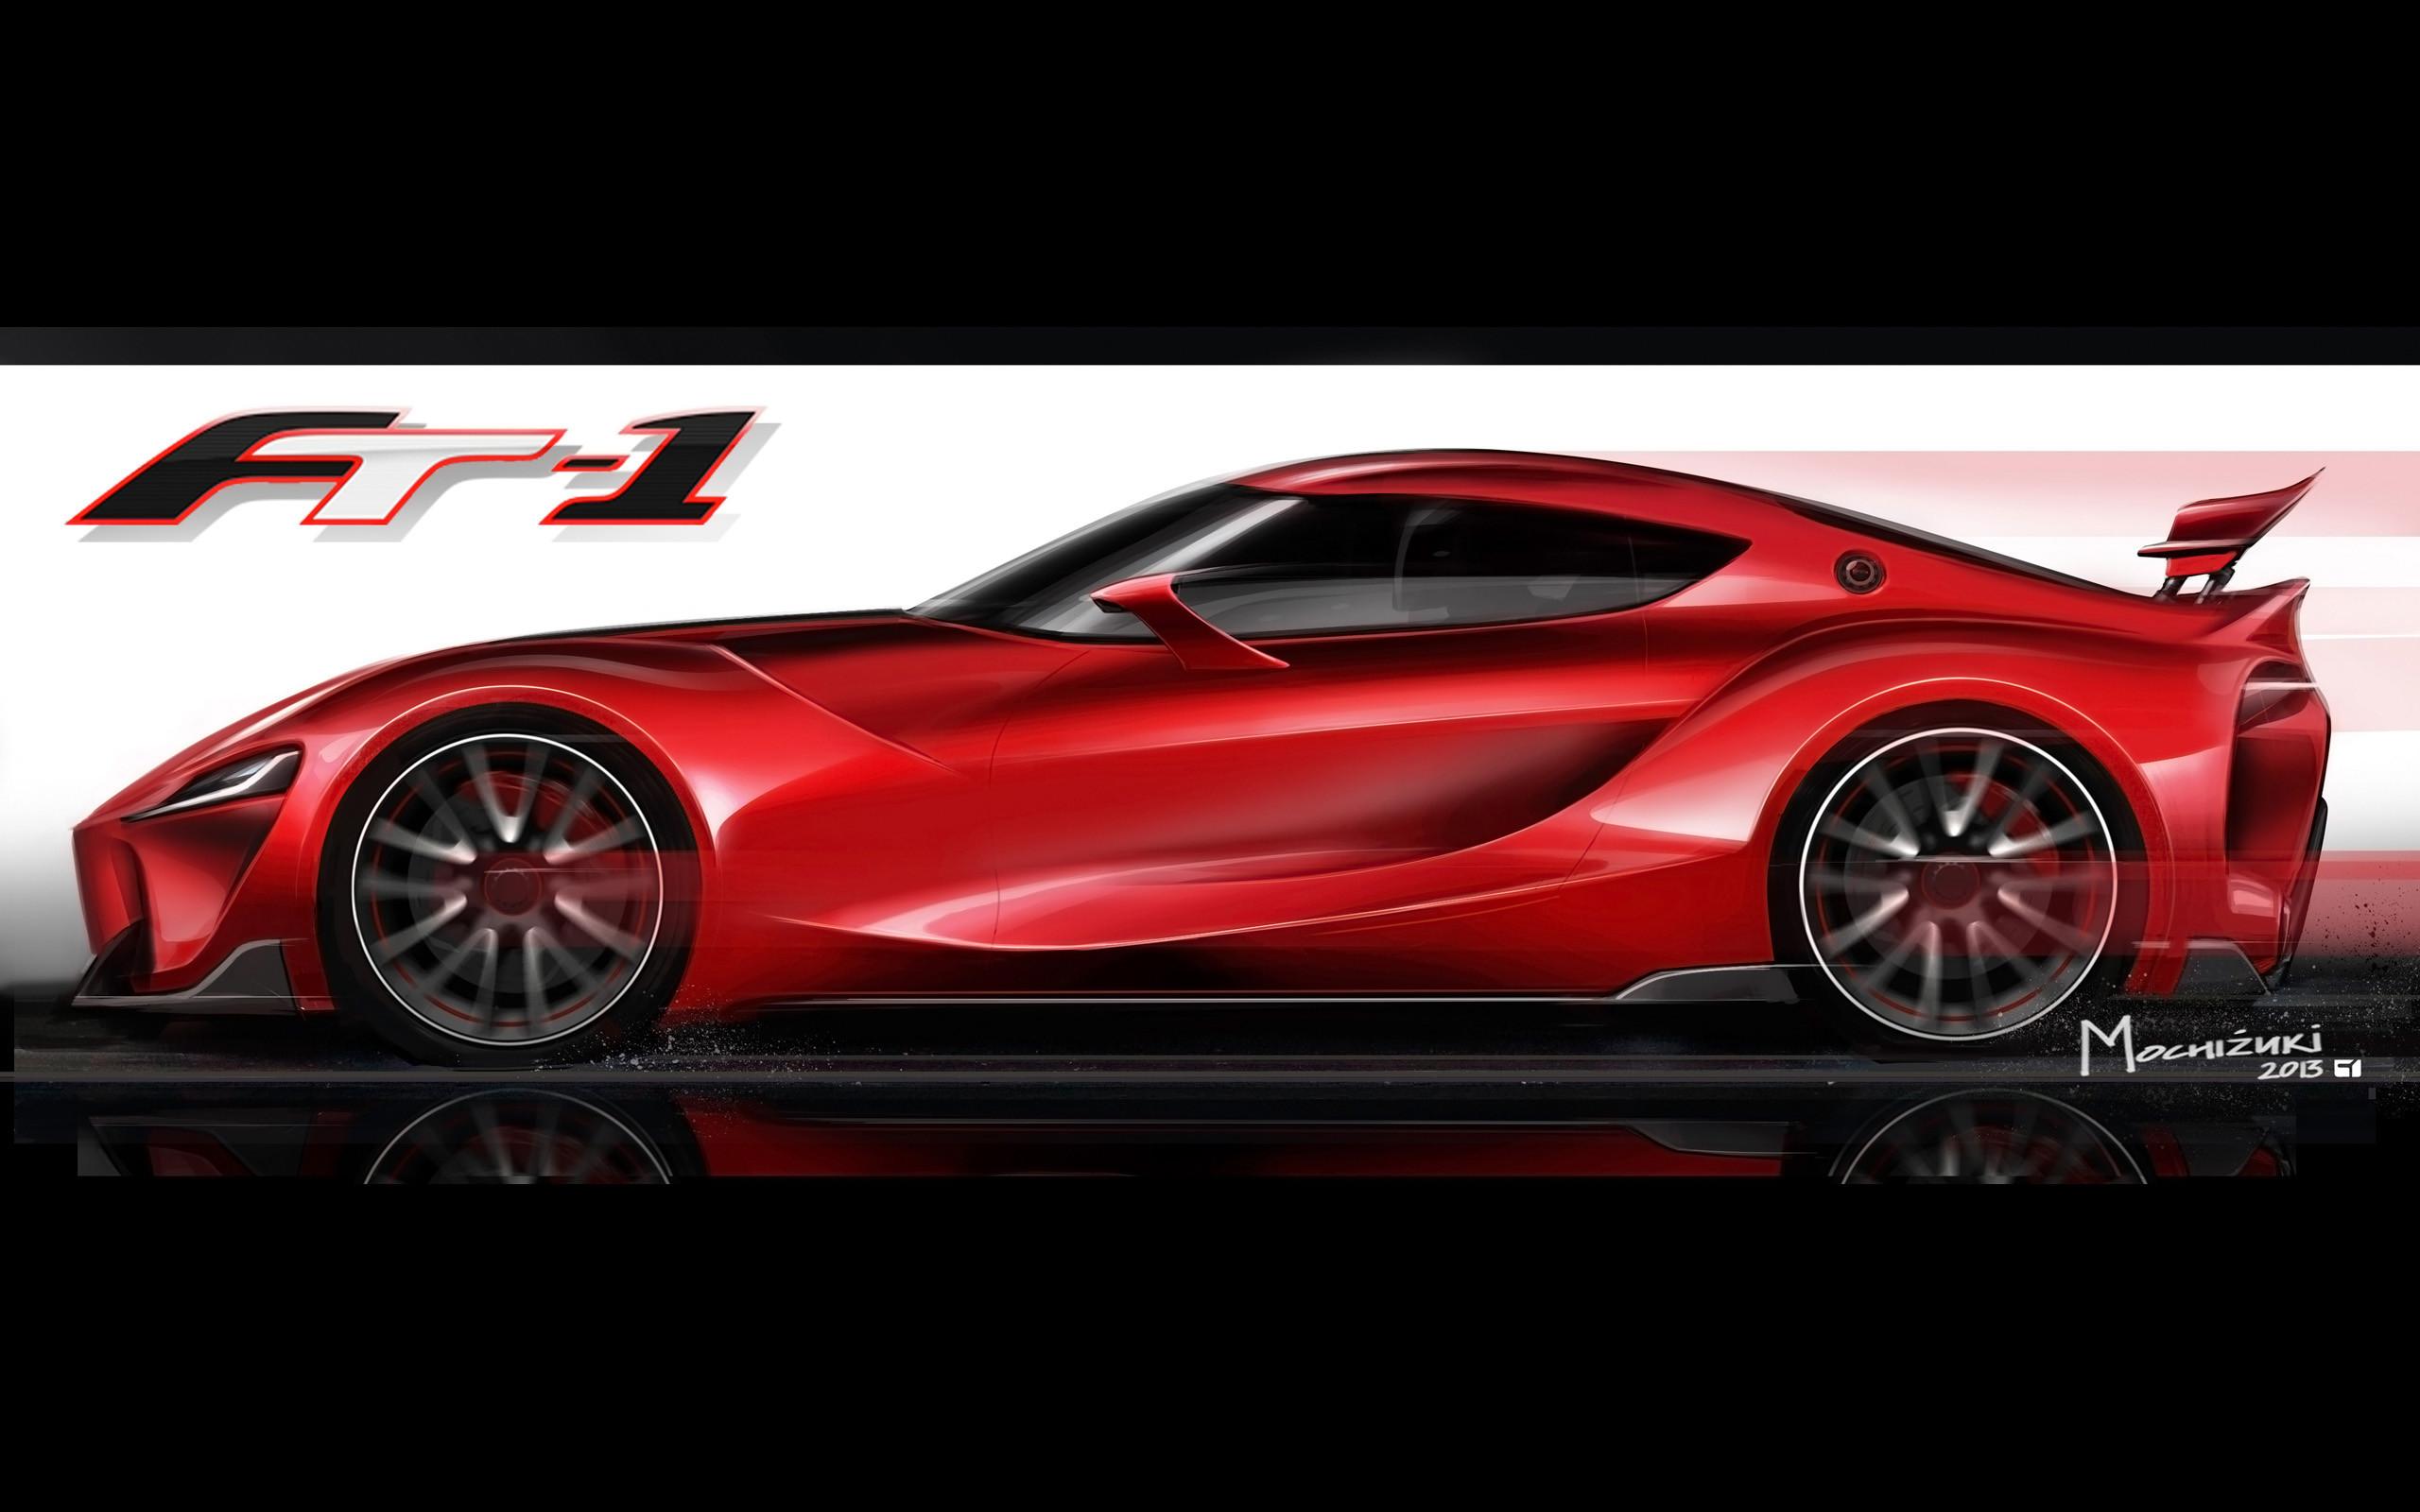 2014 Toyota FT-1 Concept supercar poster logo de wallpaper | |  230991 | WallpaperUP